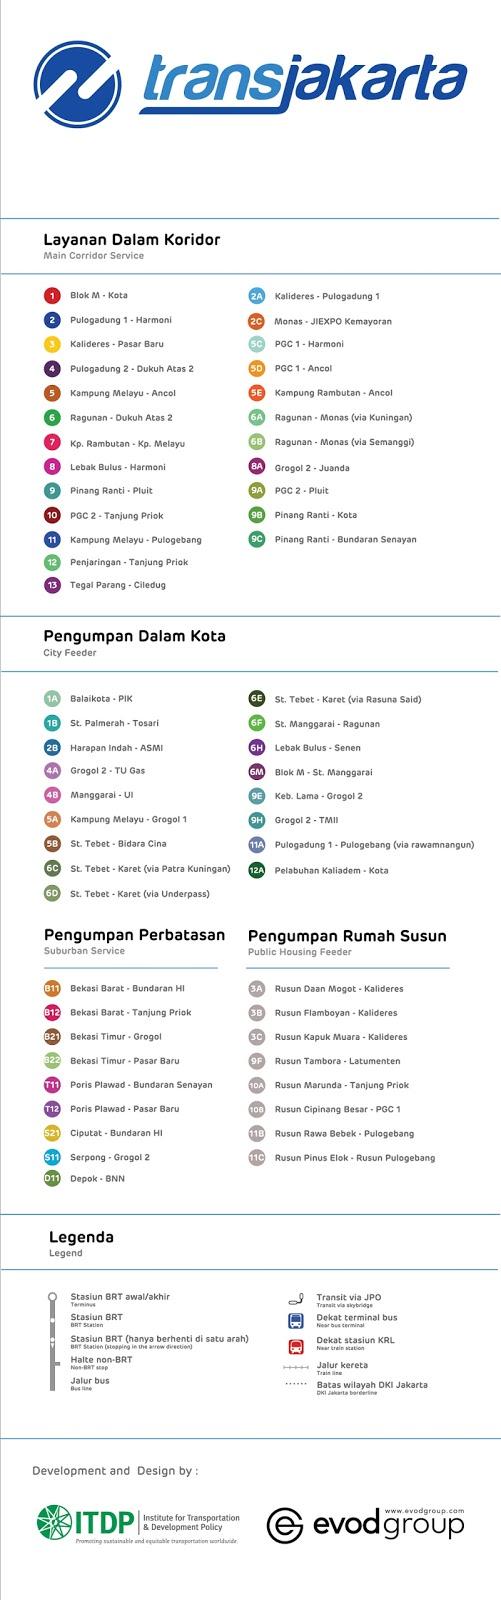 jakarta, transjakarta, rute transjakarta, koridor transjakarta, wisata, transportasi,